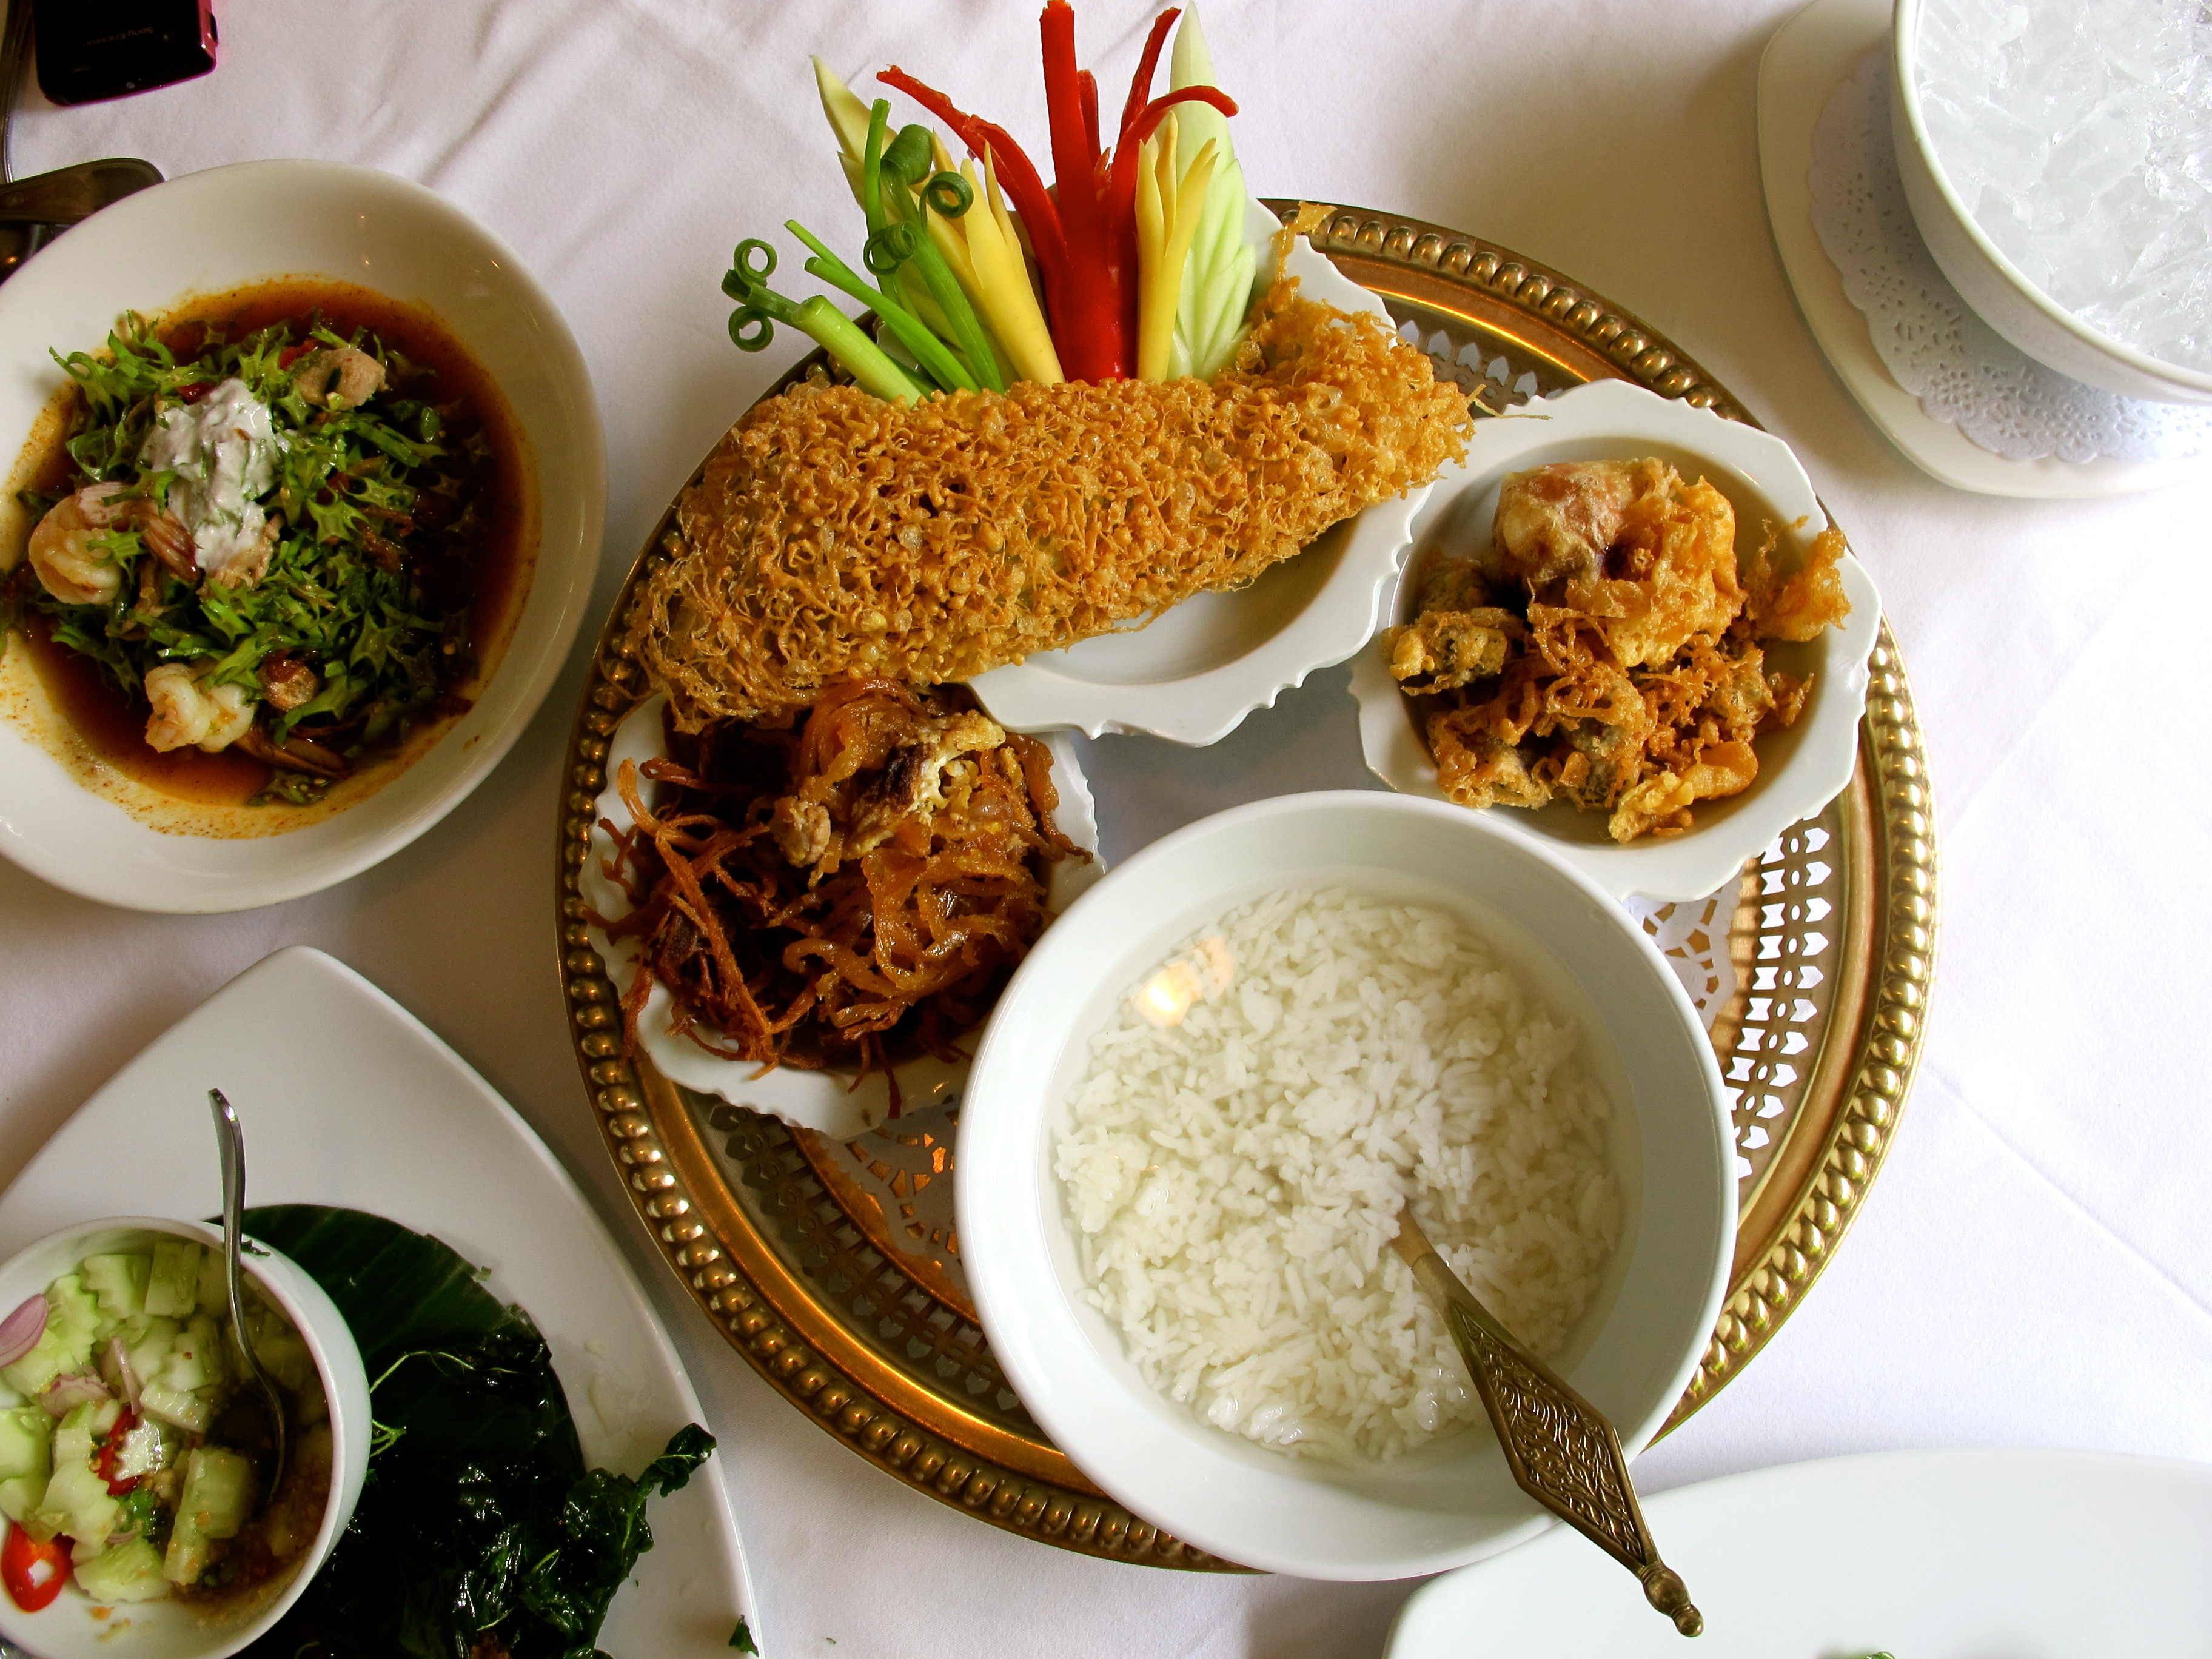 Than ying restaurant a royal thai cuisine for Cuisine royale